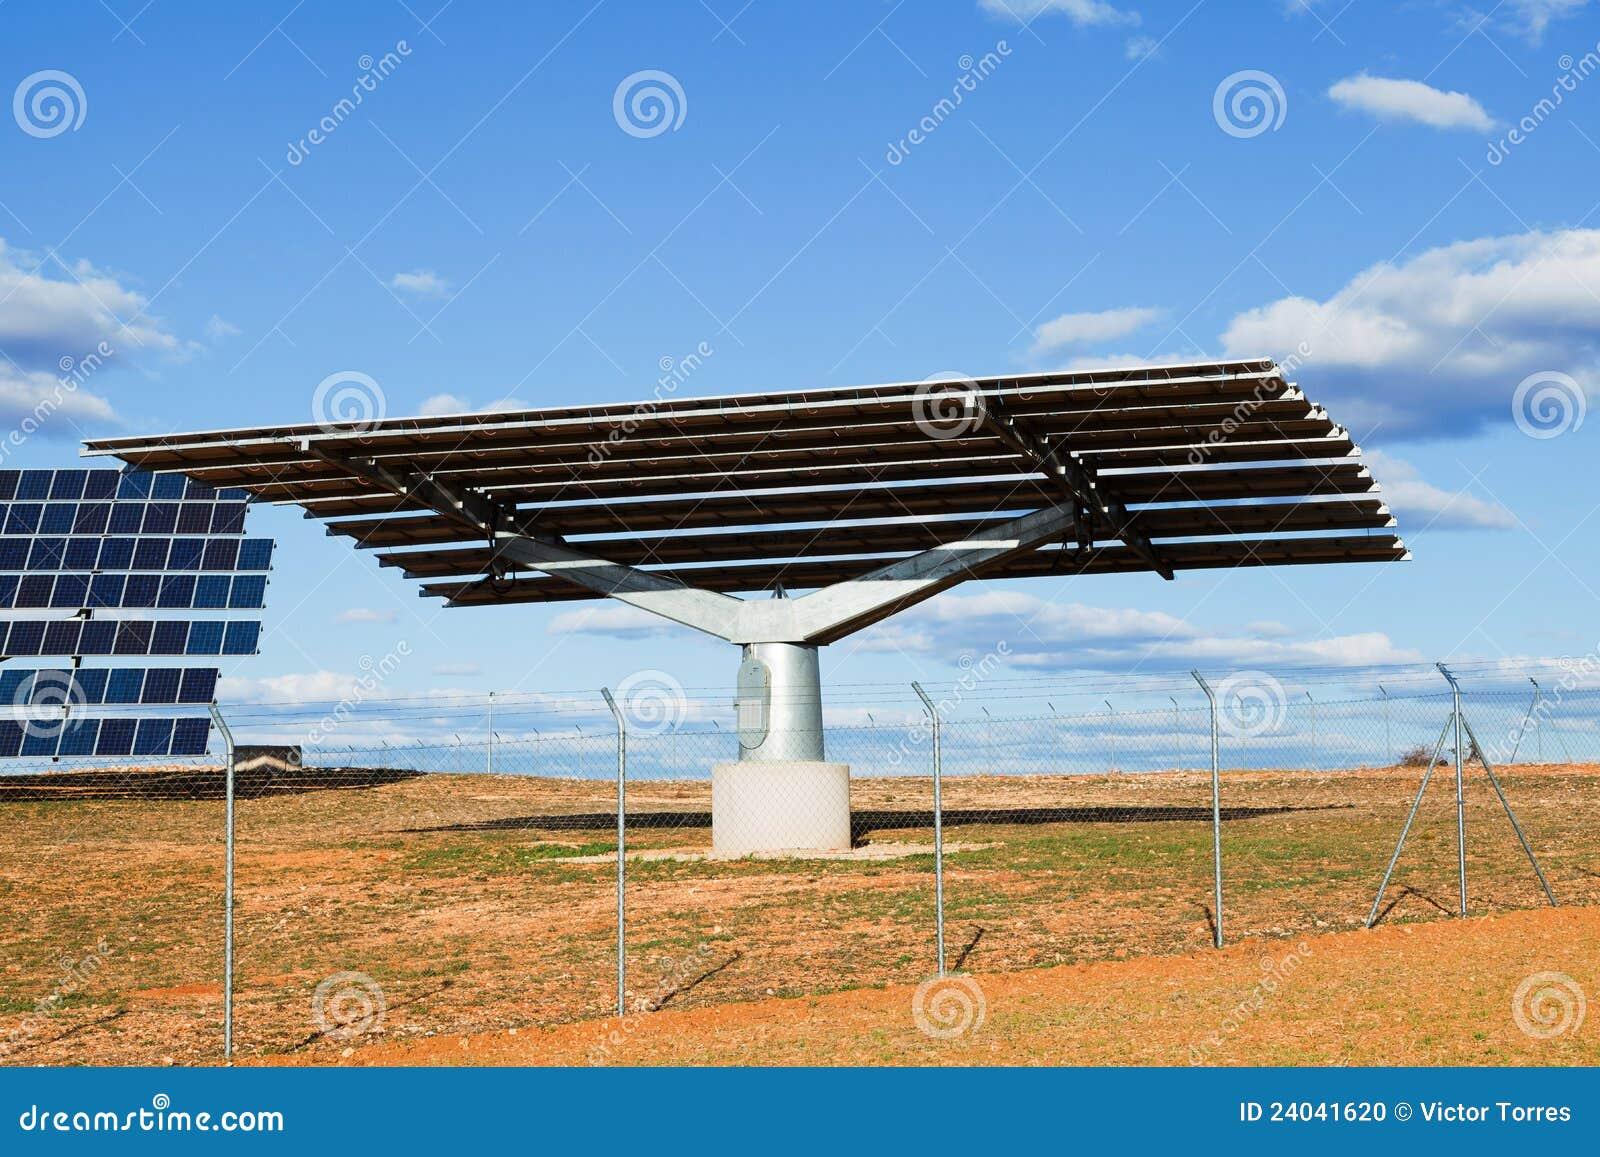 Solar Panel Structure Stock Photo - Image: 24041620